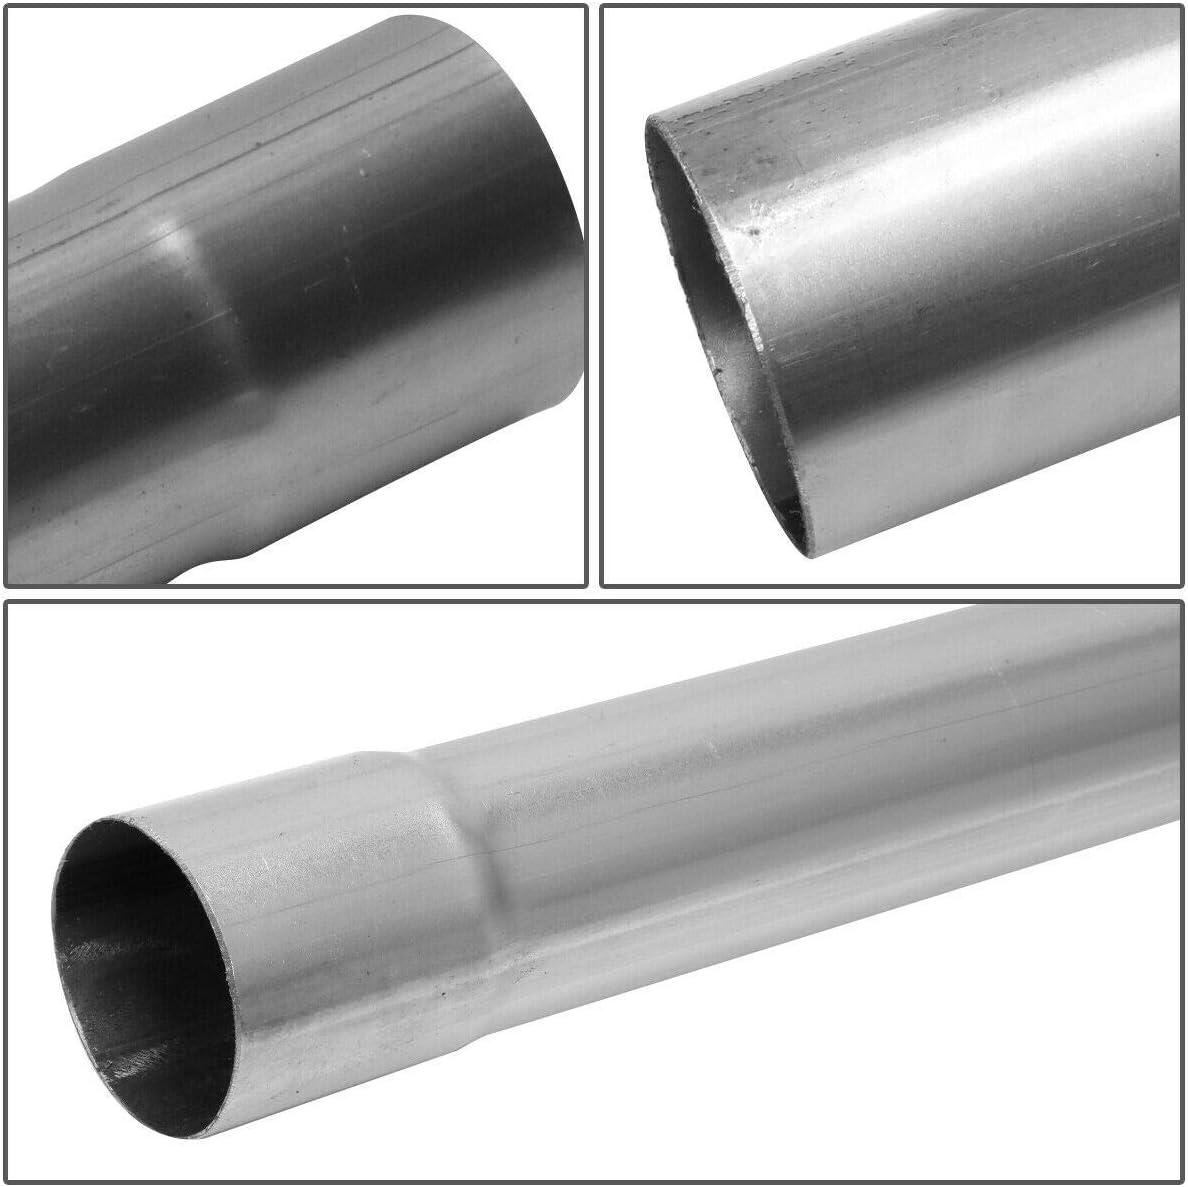 2.5 Custom Exhaust Kit Tubing Mandrel Bend Pipe Straight /& U-Bend Universal 2 1//2 8PCS